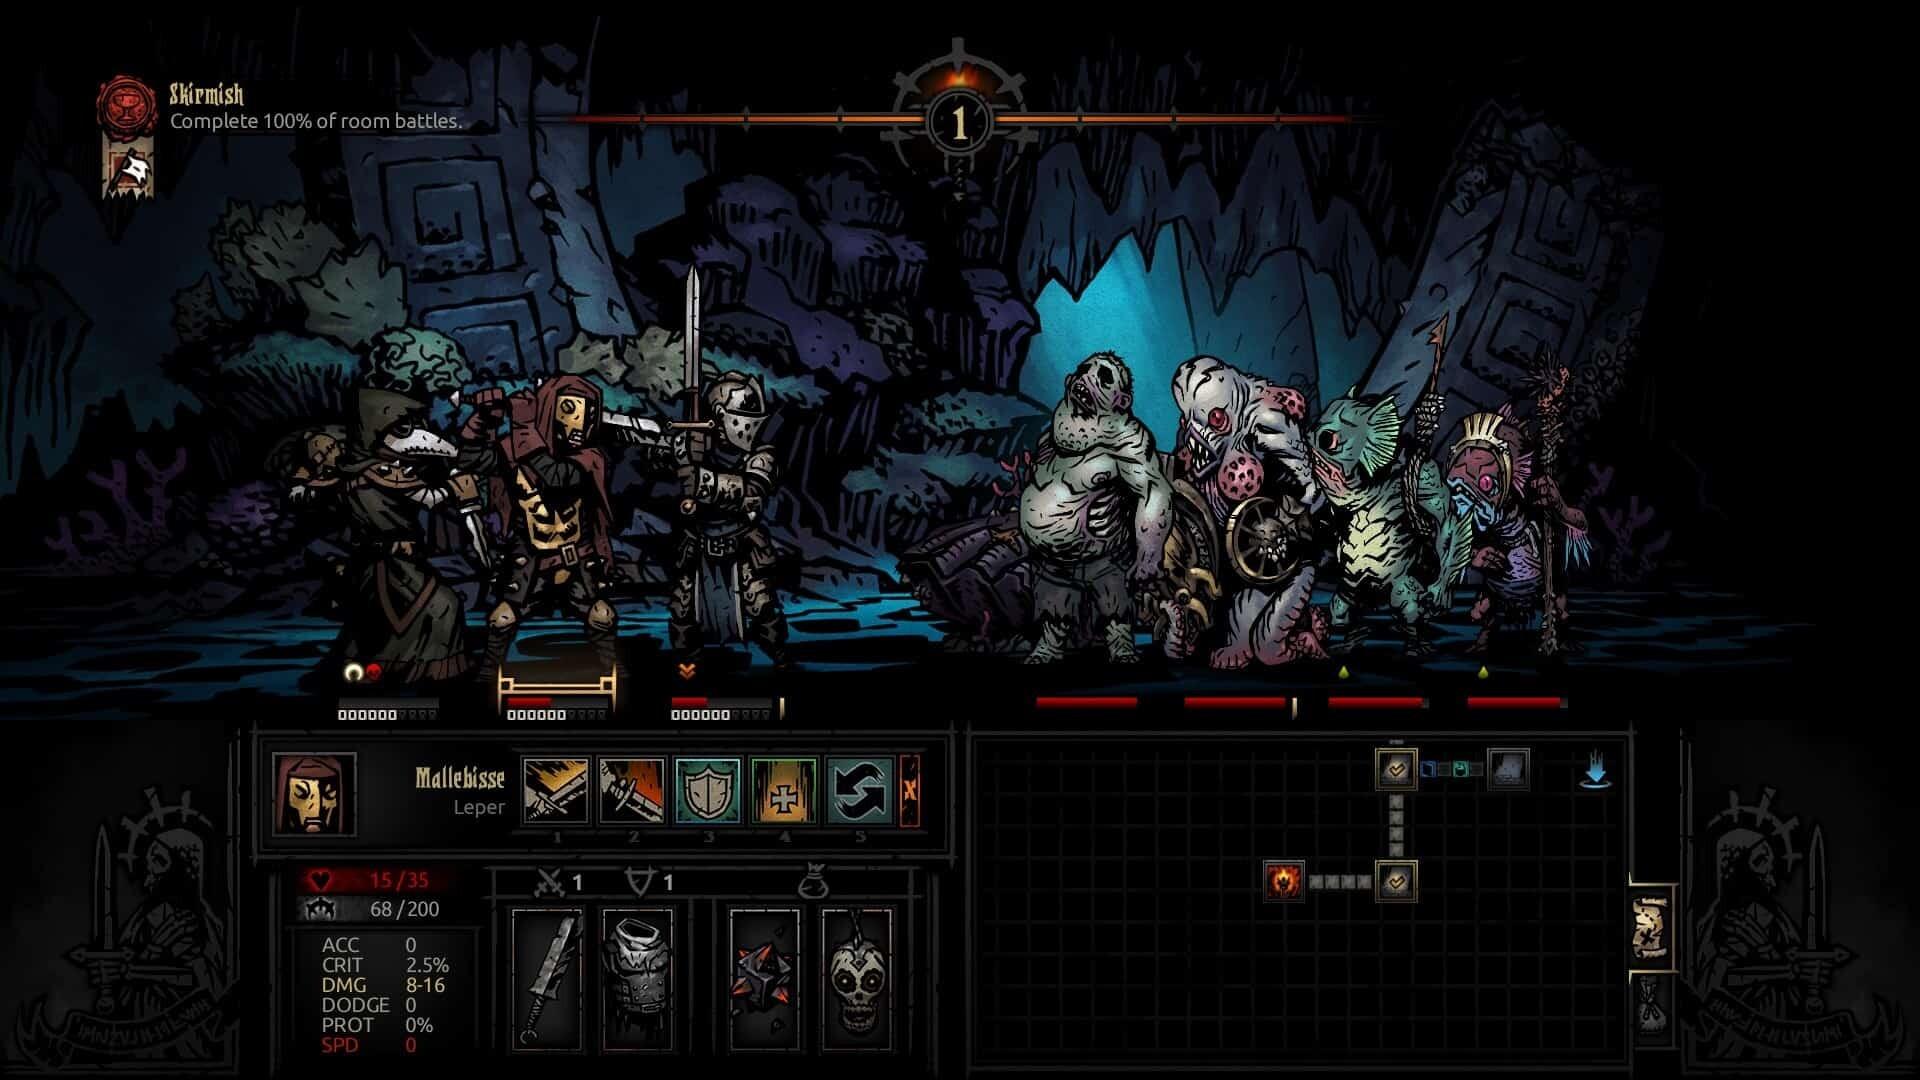 Darkest Dungeon game screenshot, cove combat